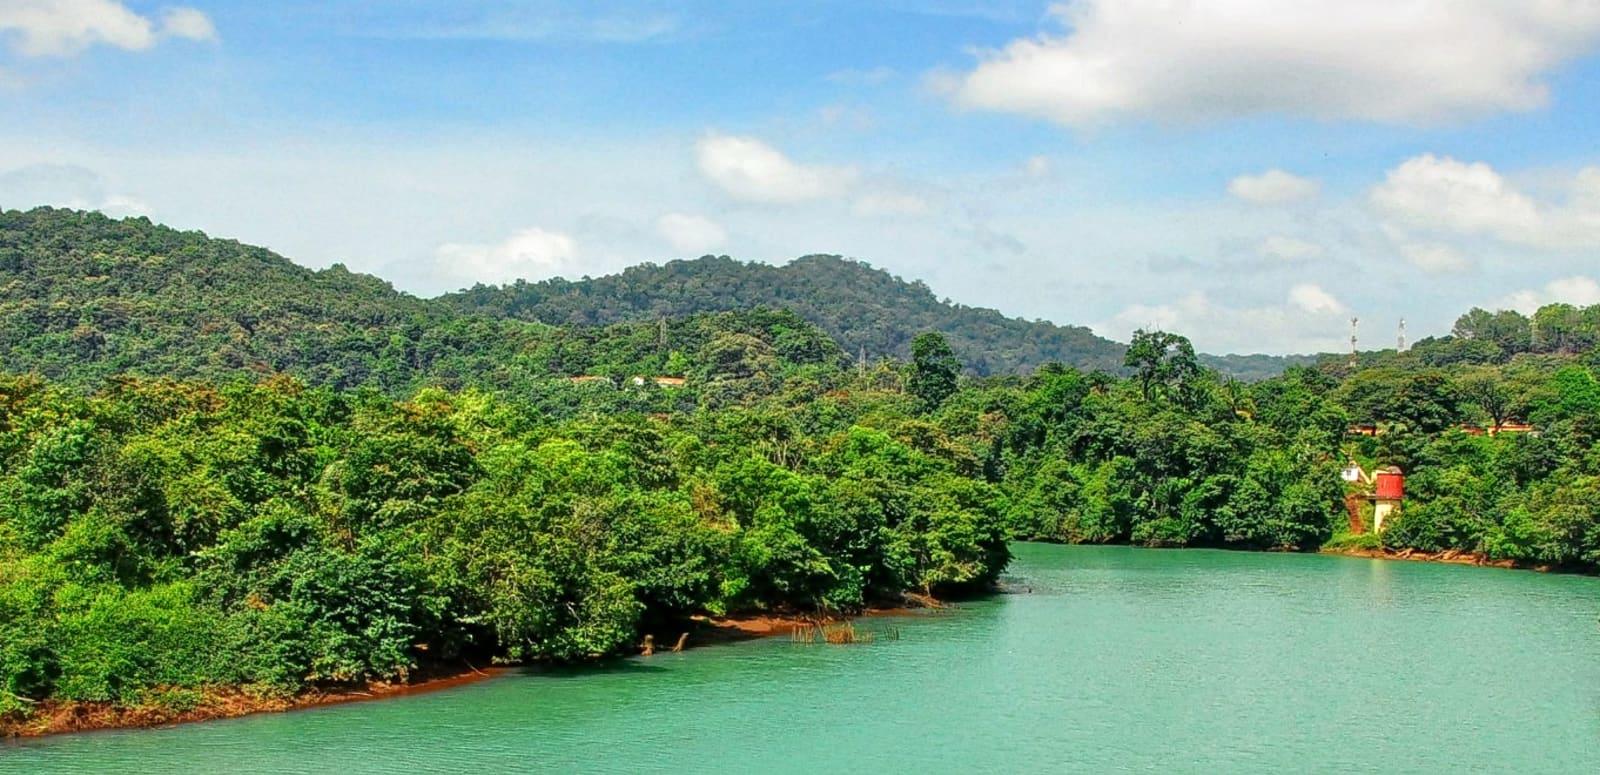 20 best tourist places near bangalore within 400 km 2019